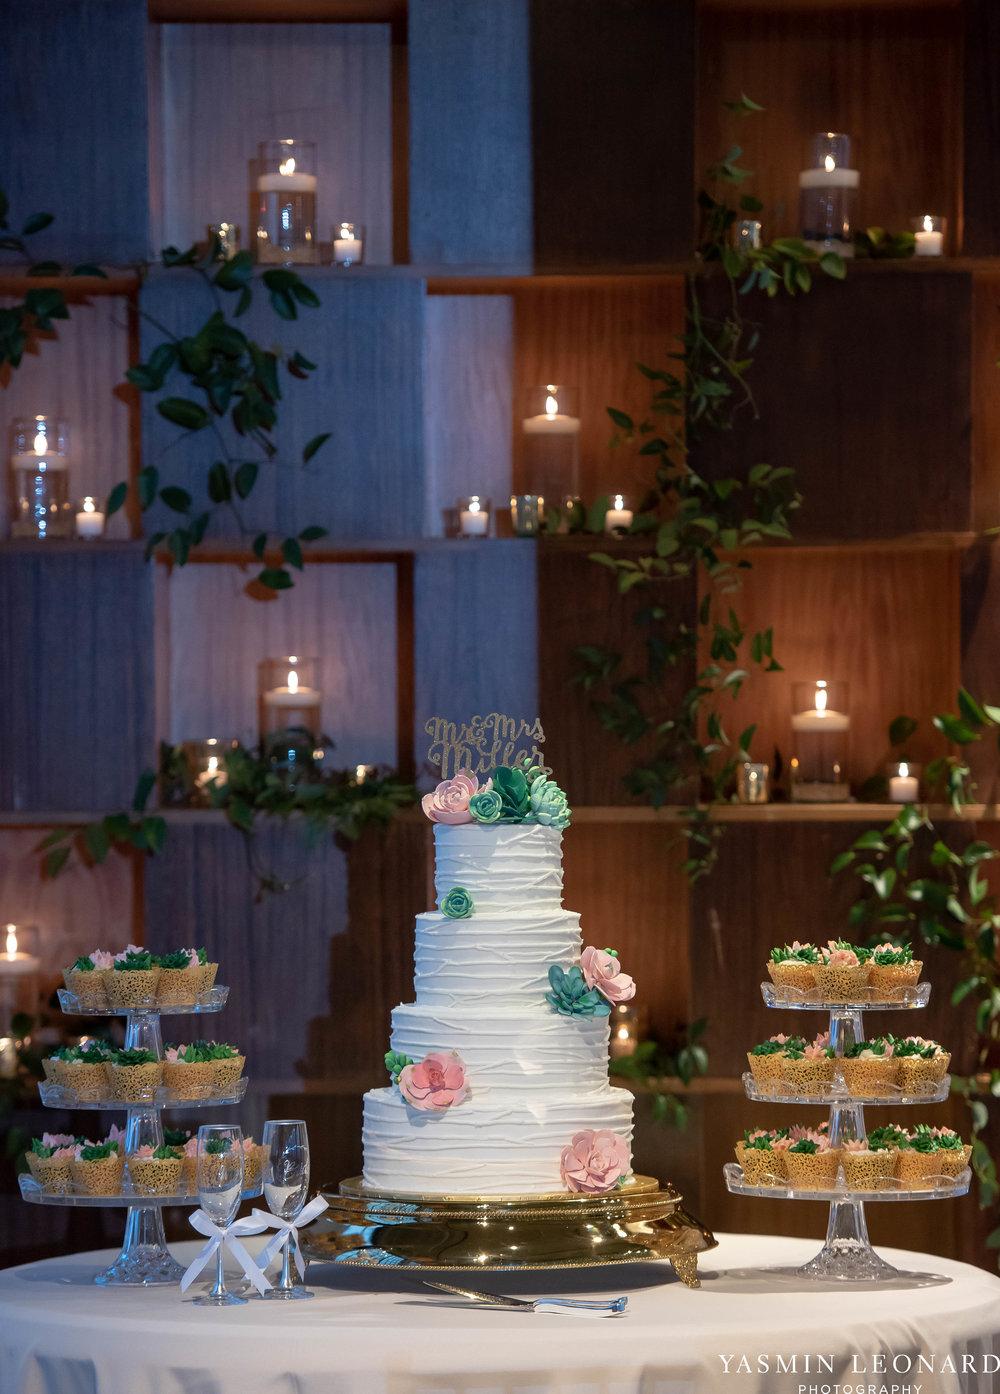 The Lofts at Union Square - Unions - High Point Weddings - NC Weddings - NC Wedding Photographer - Yasmin Leonard Photography - Just Priceless - Green Pink and Gold Wedding - Elegant Wedding-78.jpg